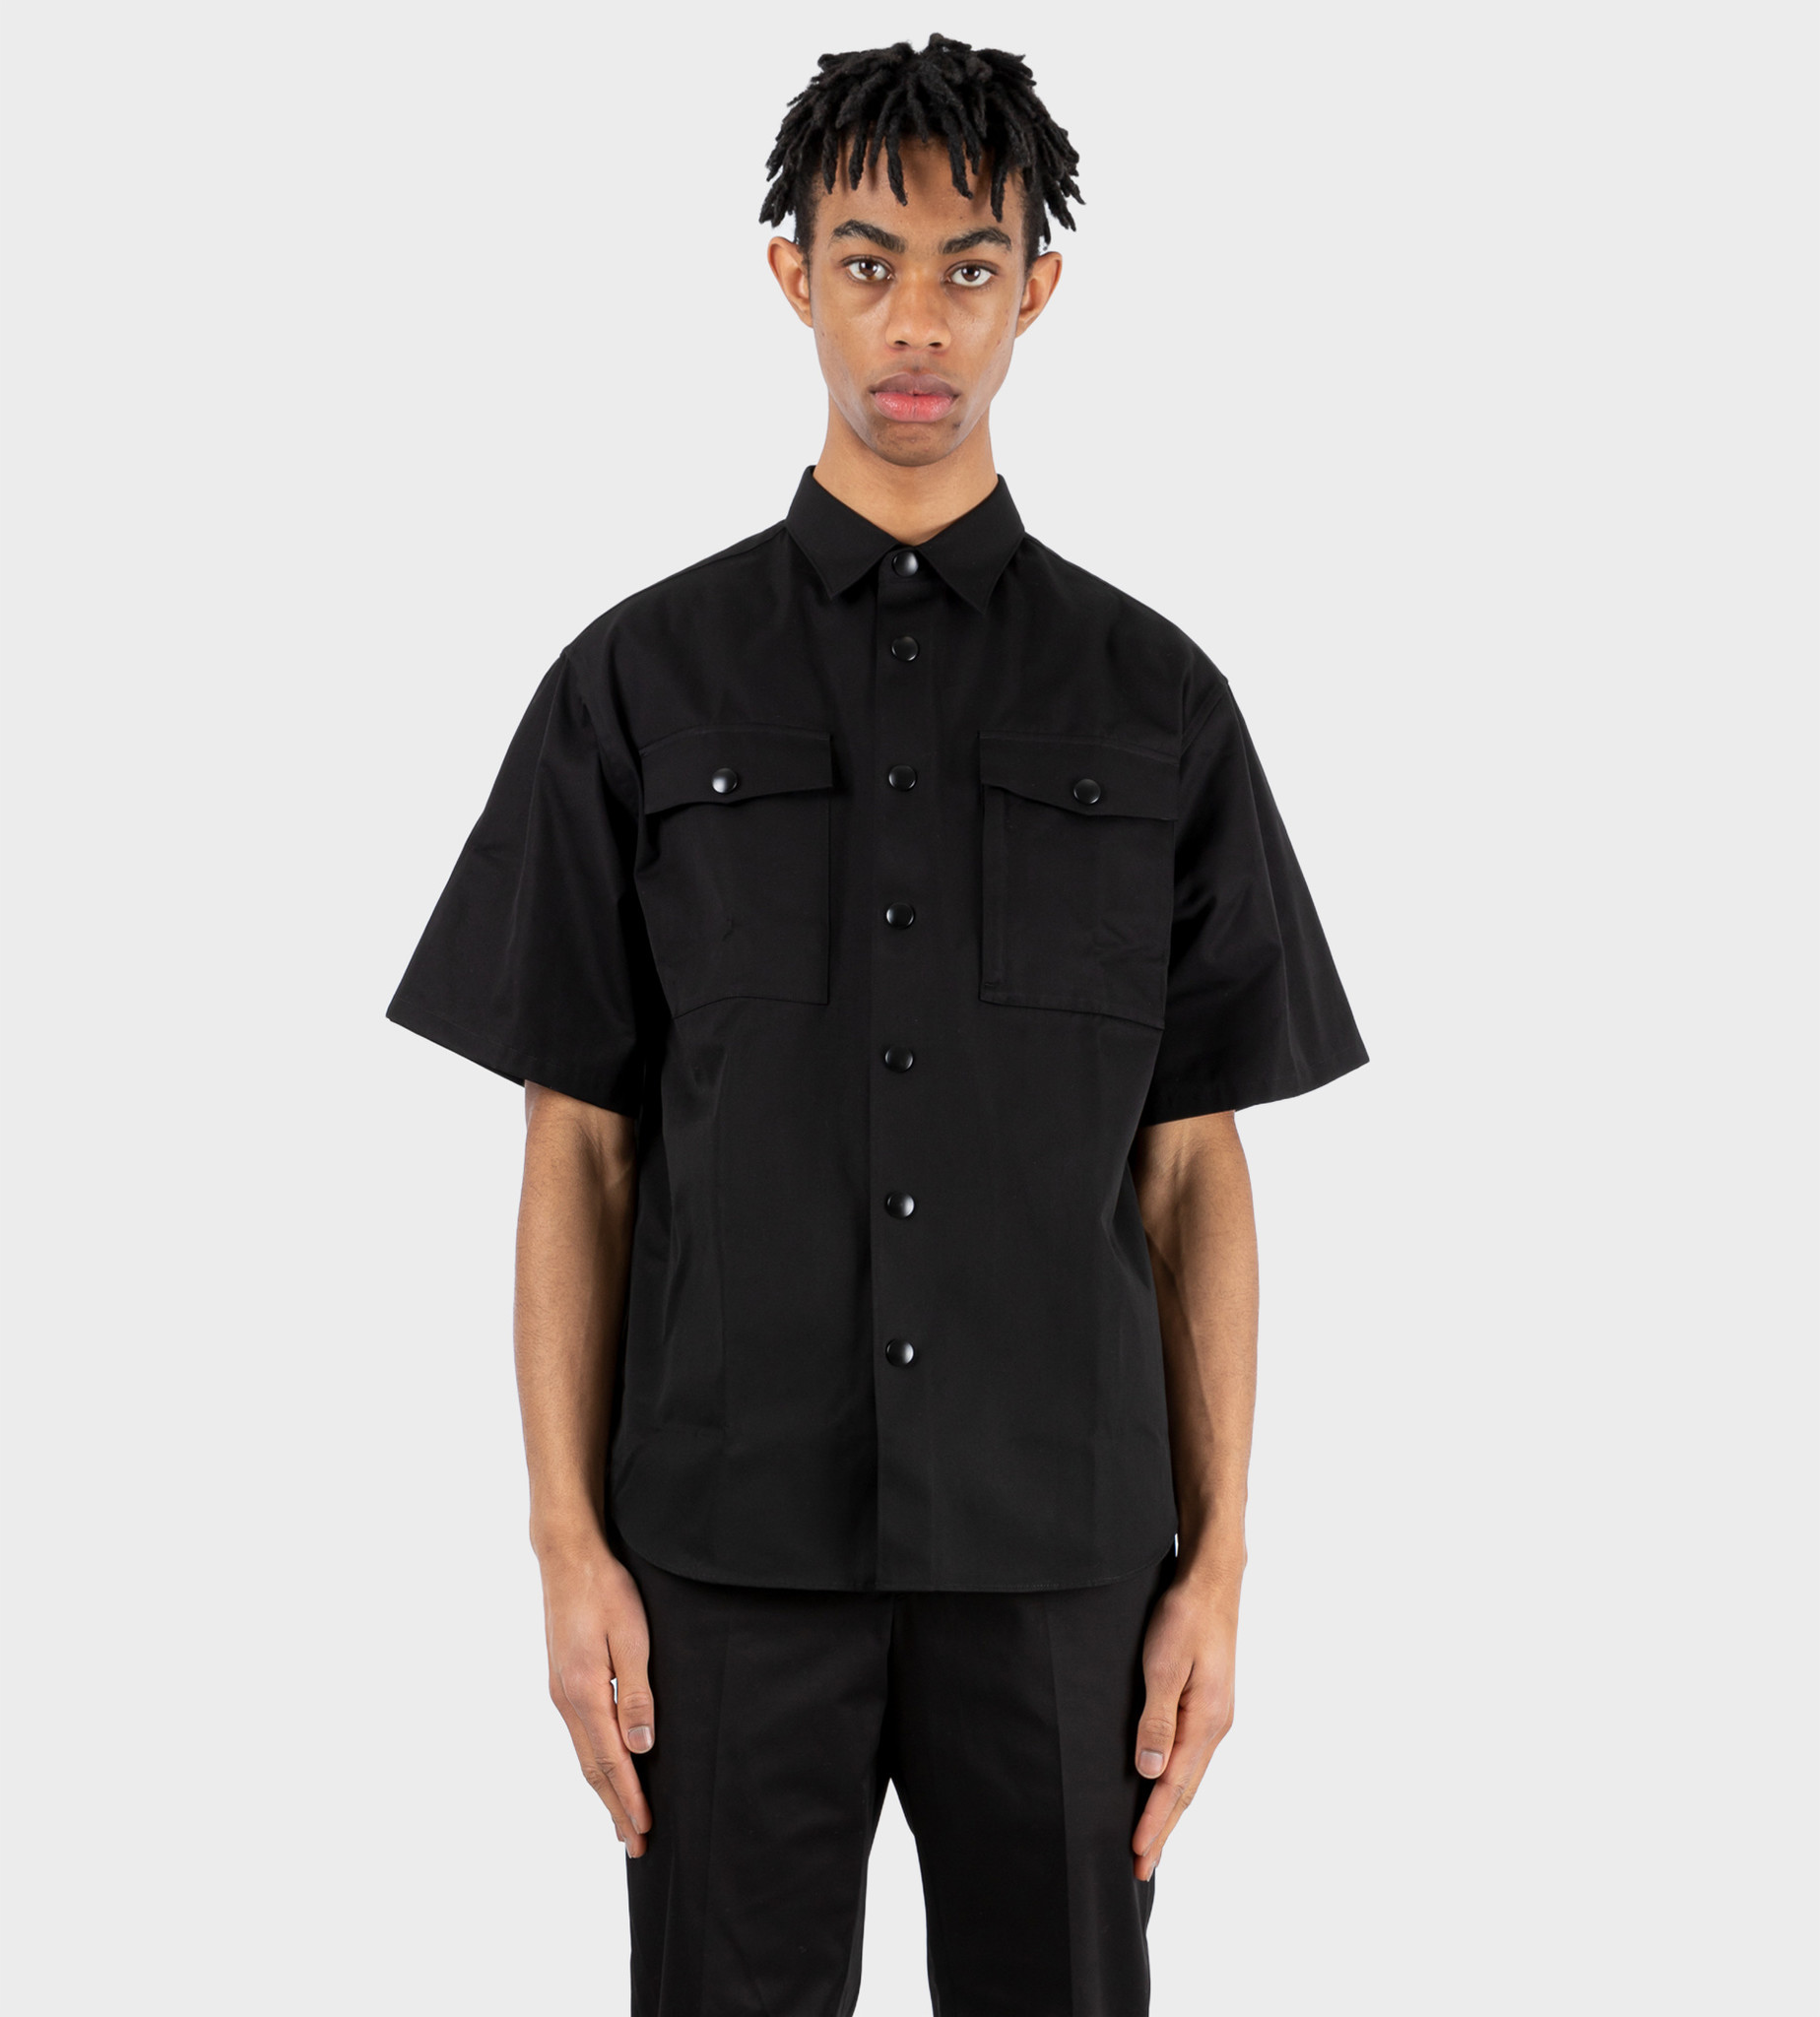 PRADA Short-Sleeved Heavy Cotton Shirt Black